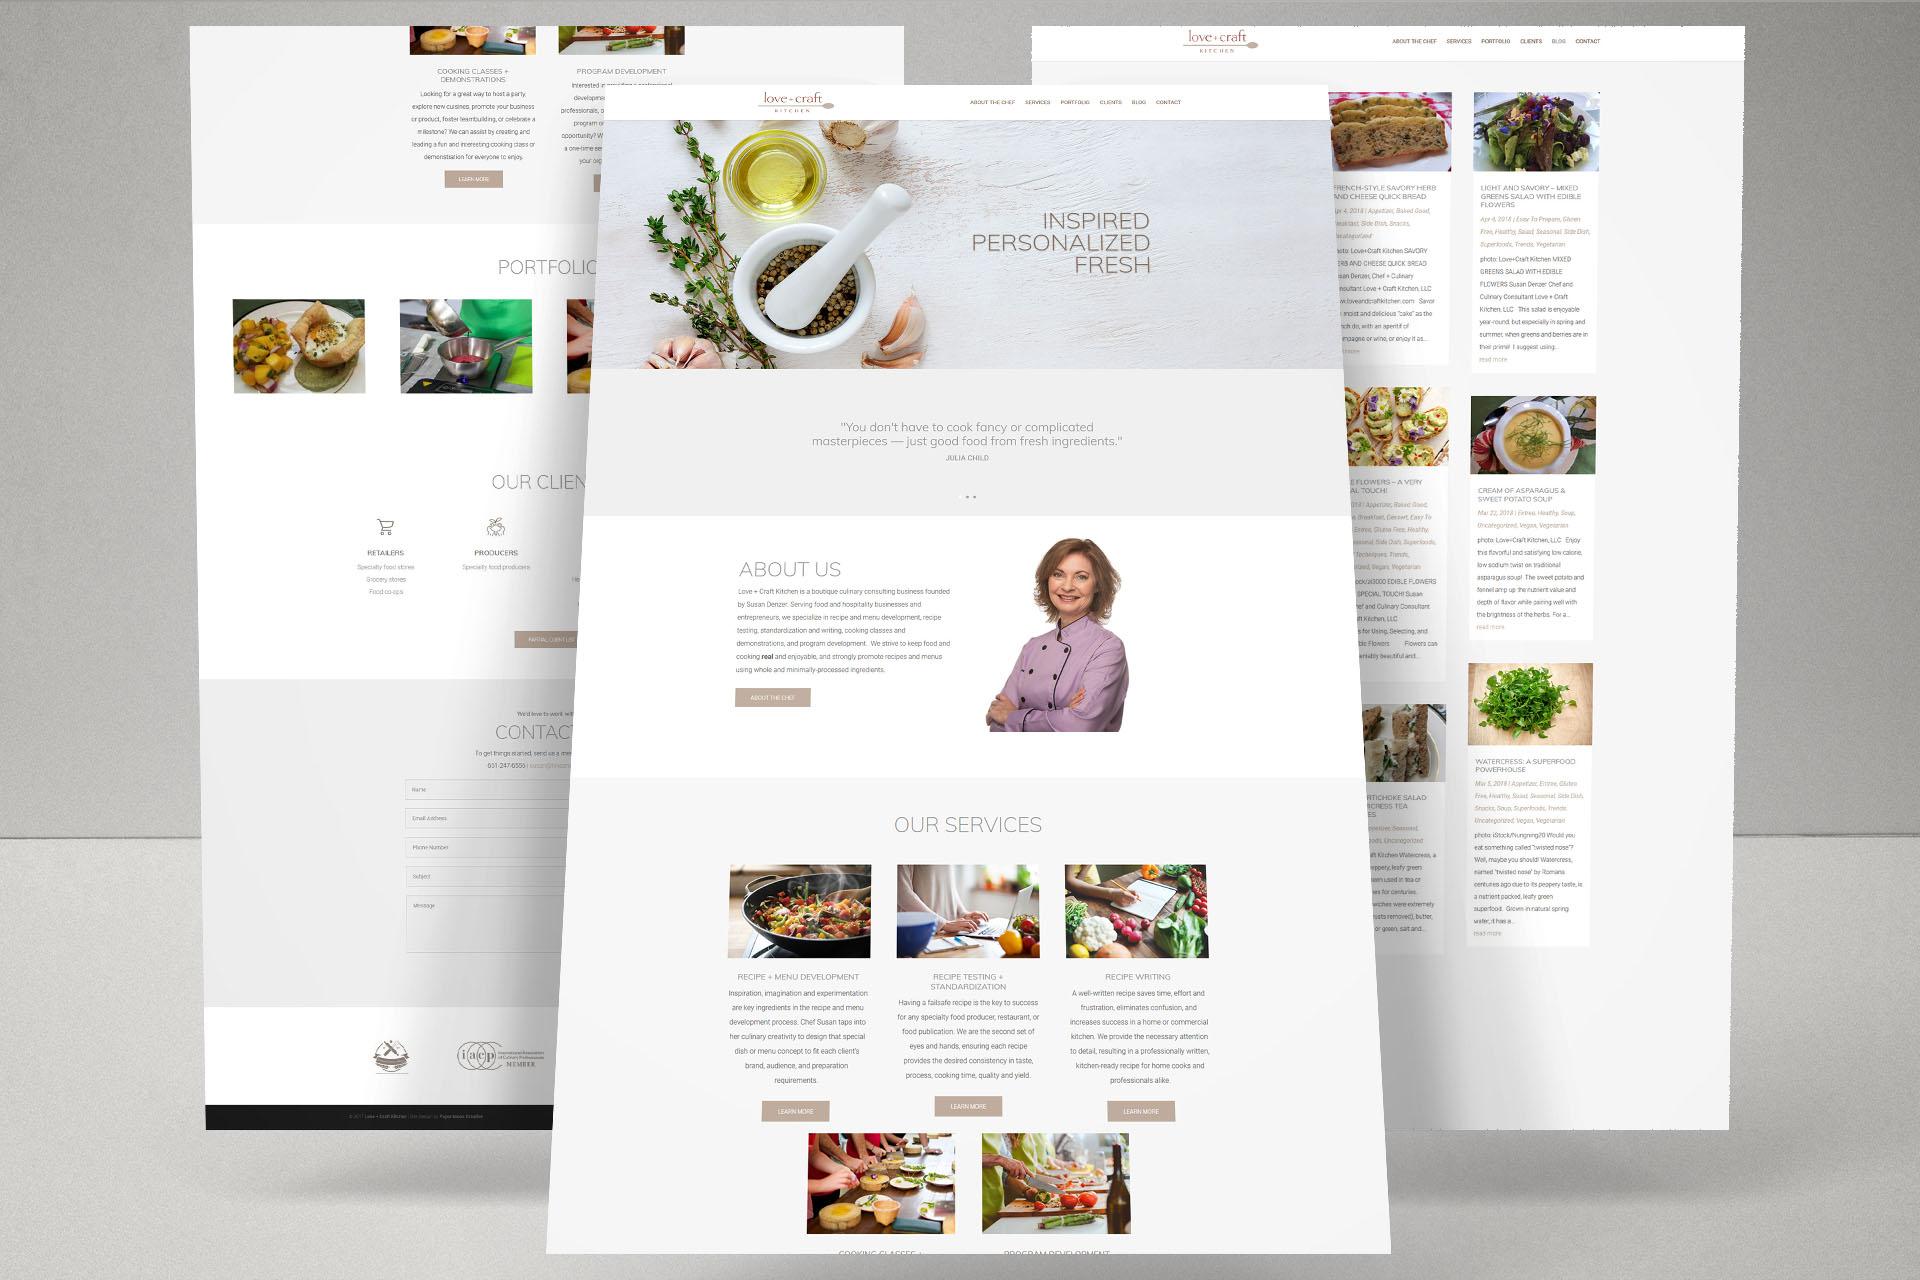 responsive web mockup image